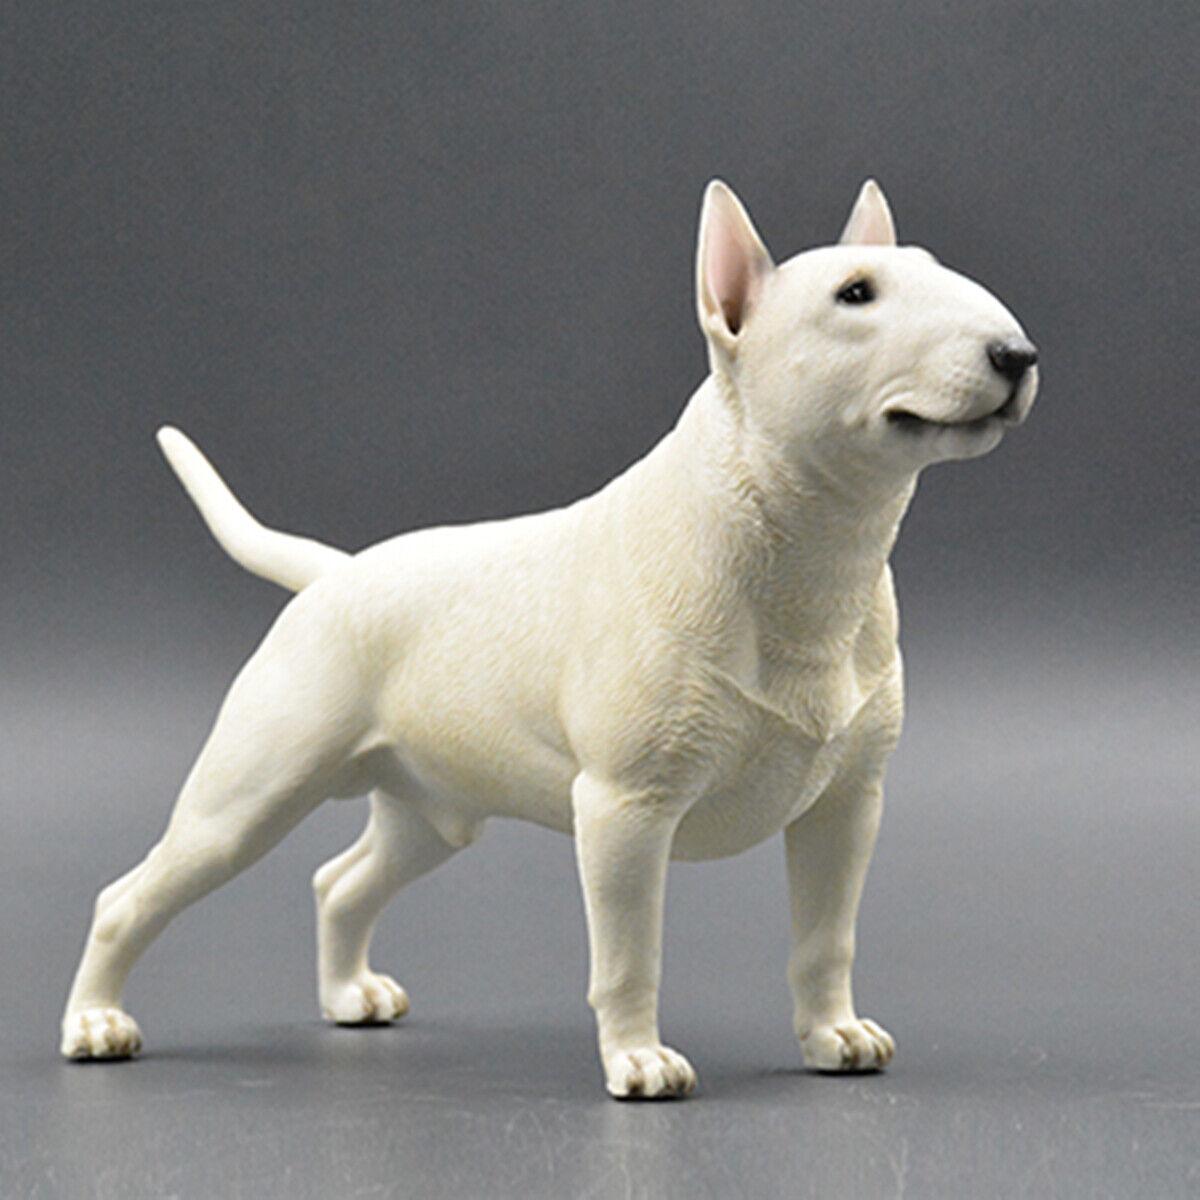 1 4 Bull Terrier Bulldog Dog Pet Figure Blslterrier Animal Model Collector Toy